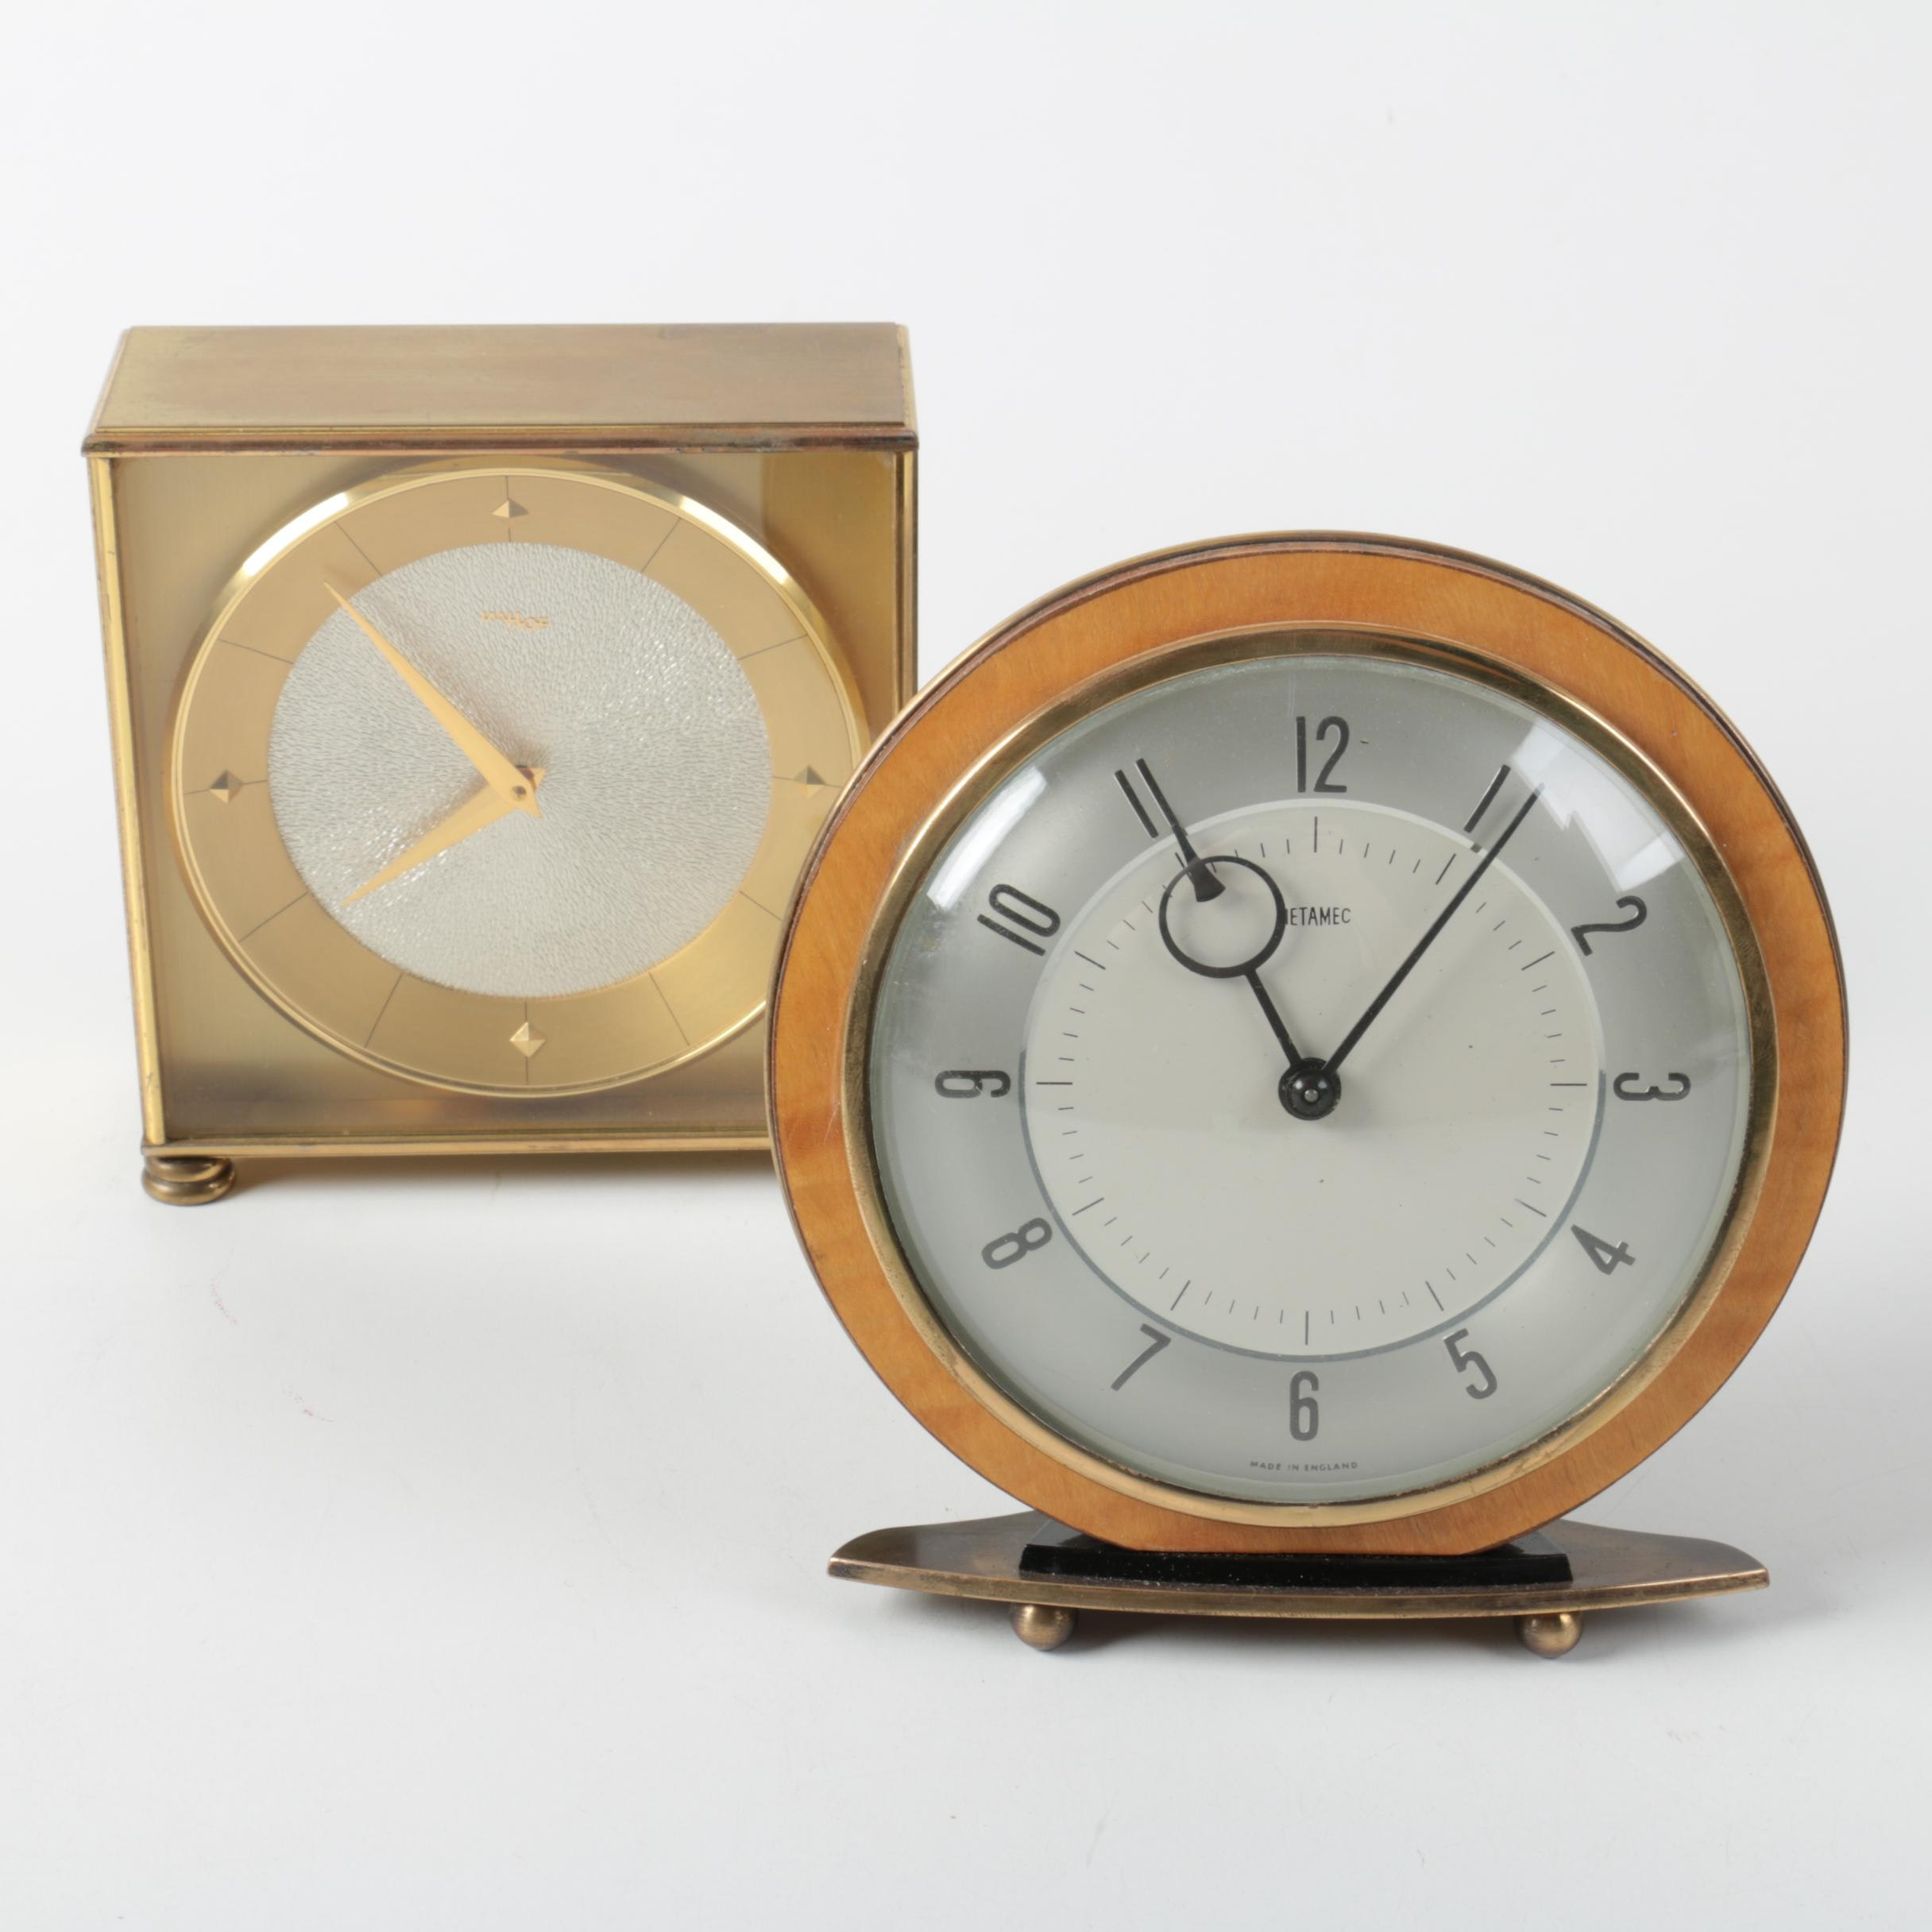 Vintage Art Deco Style Desk Clocks including Metamec and Imhof